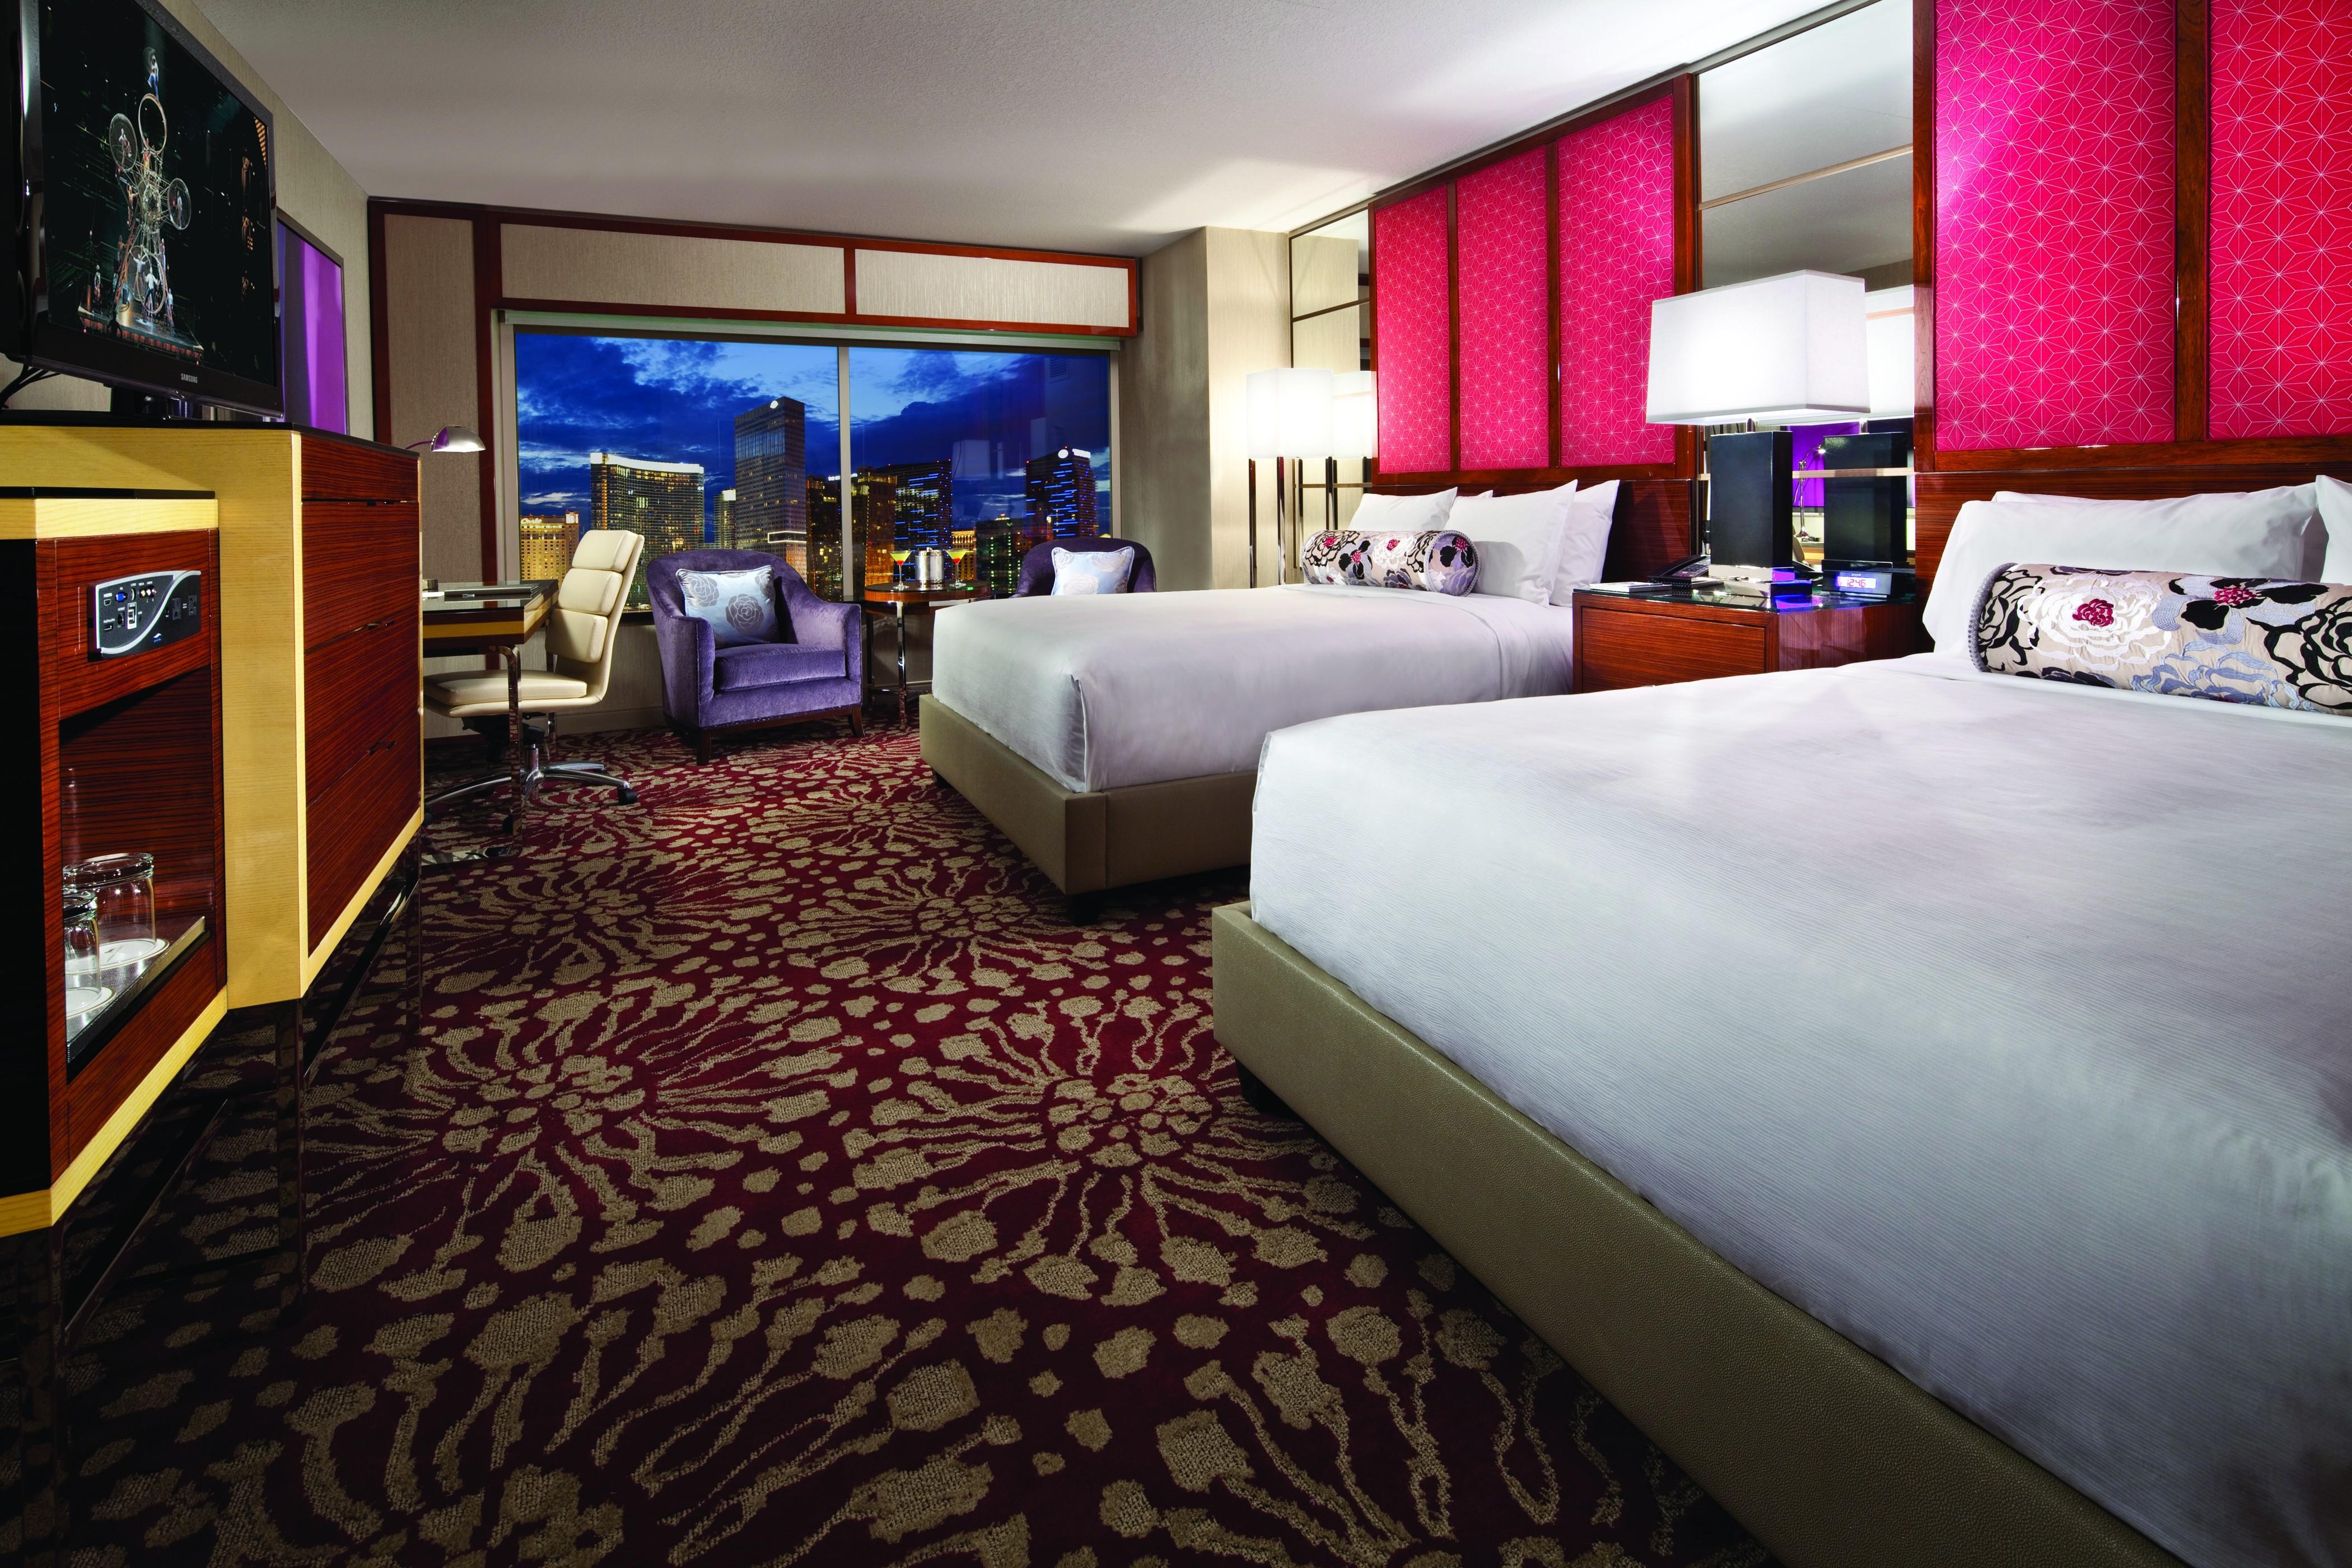 M.g.m. grand hotel casino global cash check cashing harrahs casino